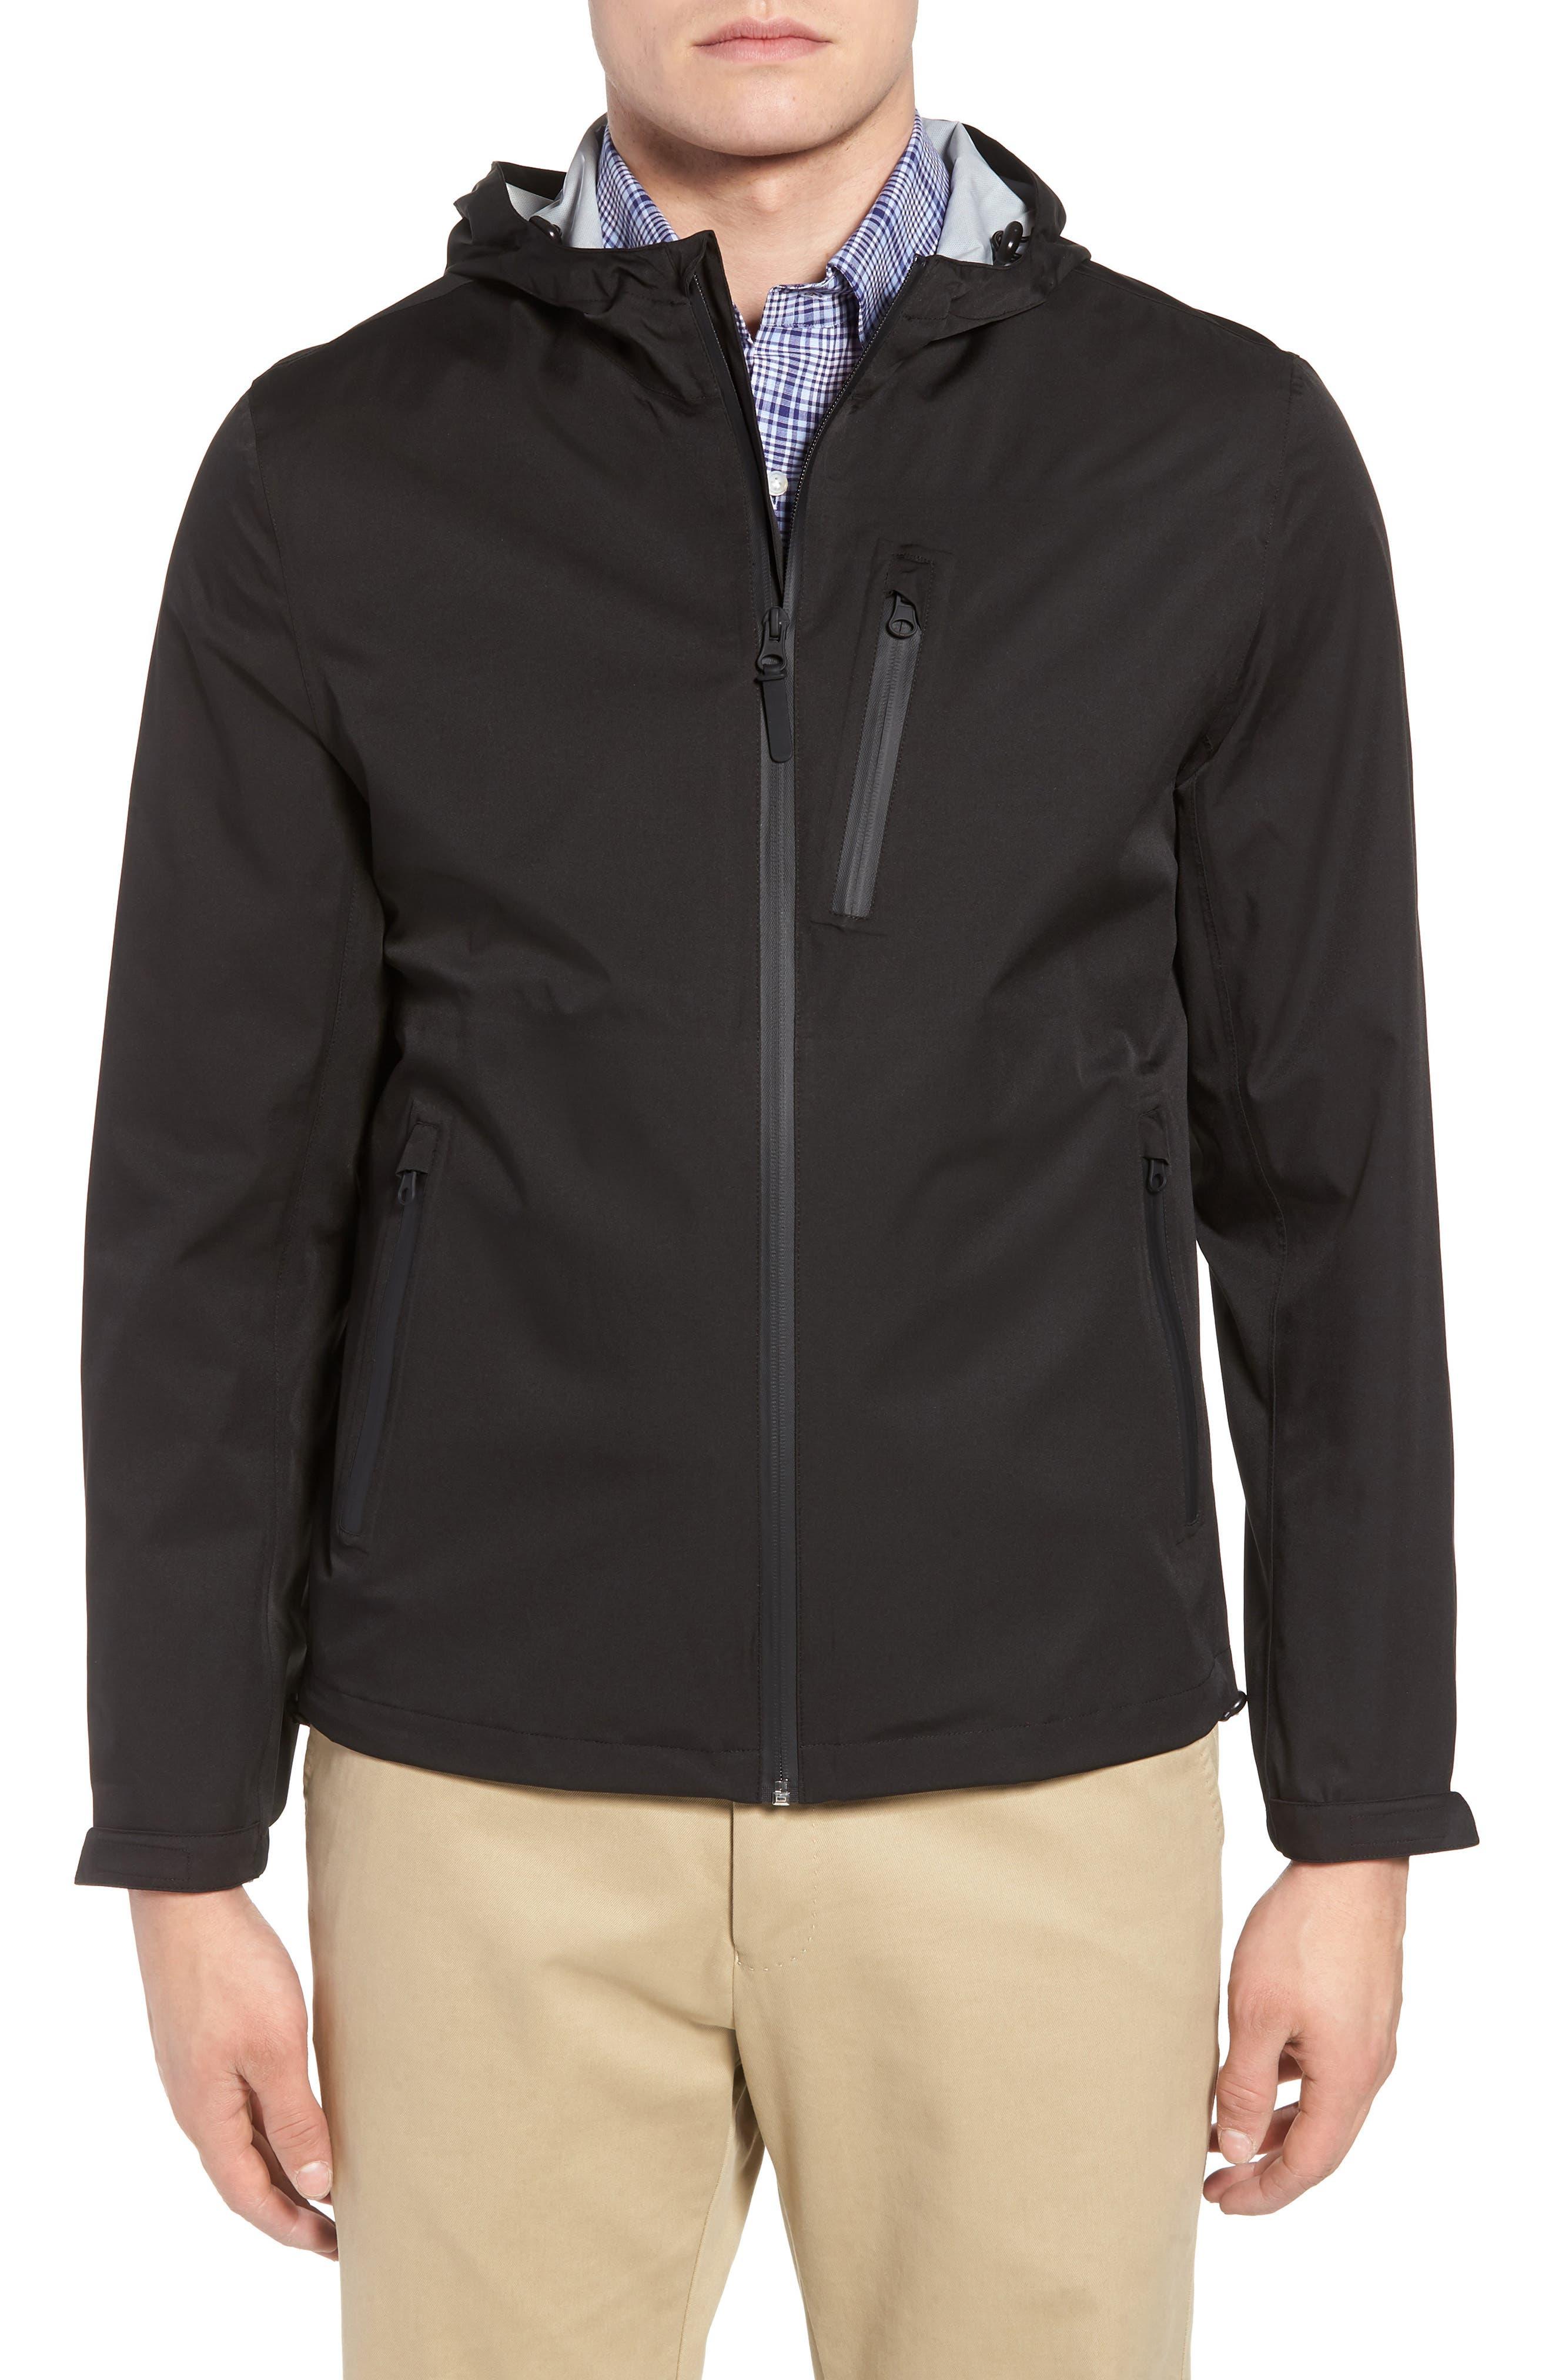 Packable Water Resistant Jacket,                             Main thumbnail 1, color,                             BLACK